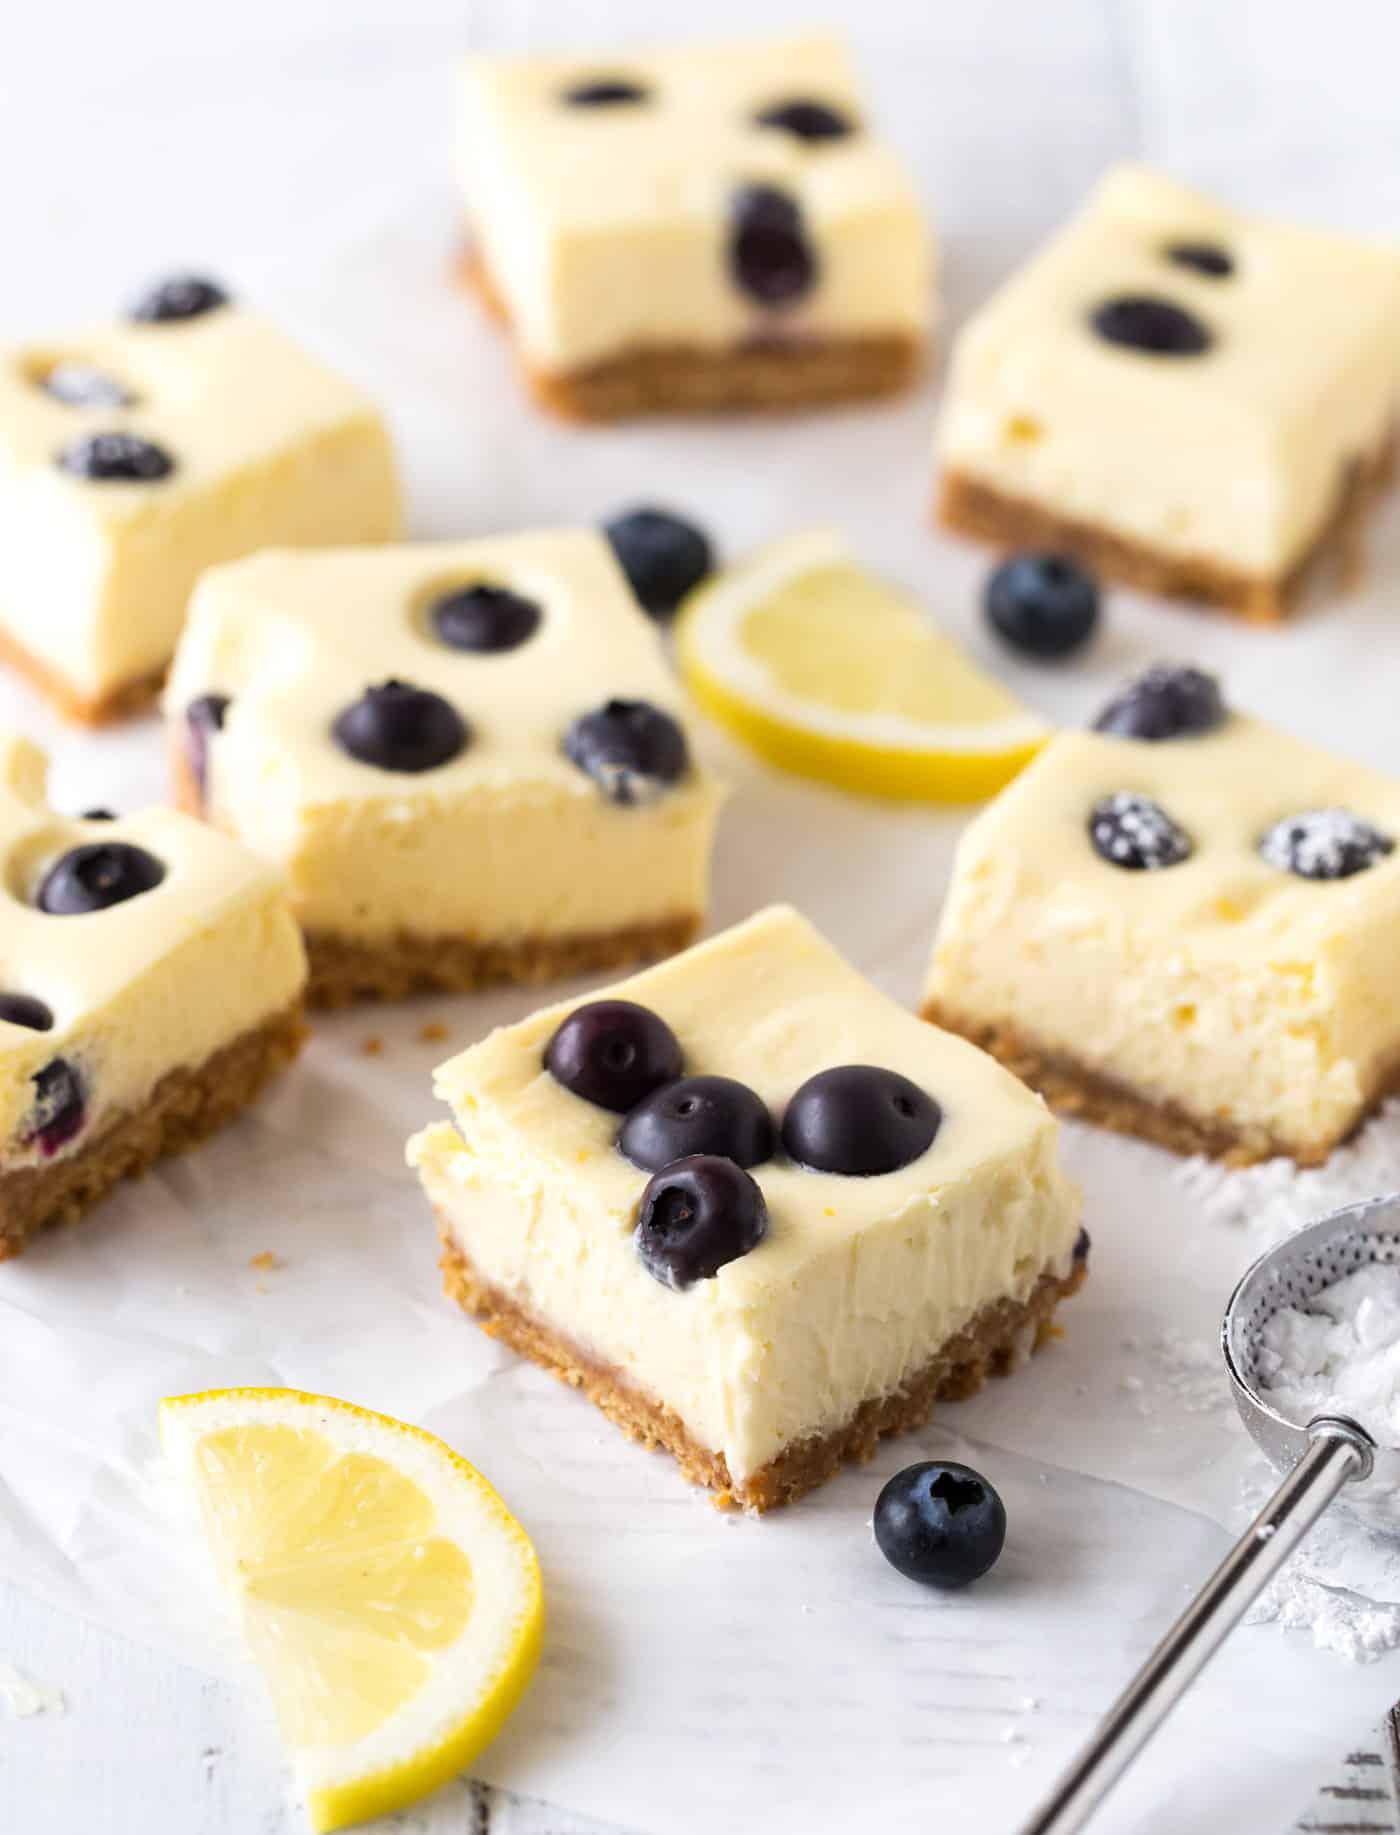 Side shot of lemon blueberry cheesecake bars with fresh blueberries and lemon slices for garnish.